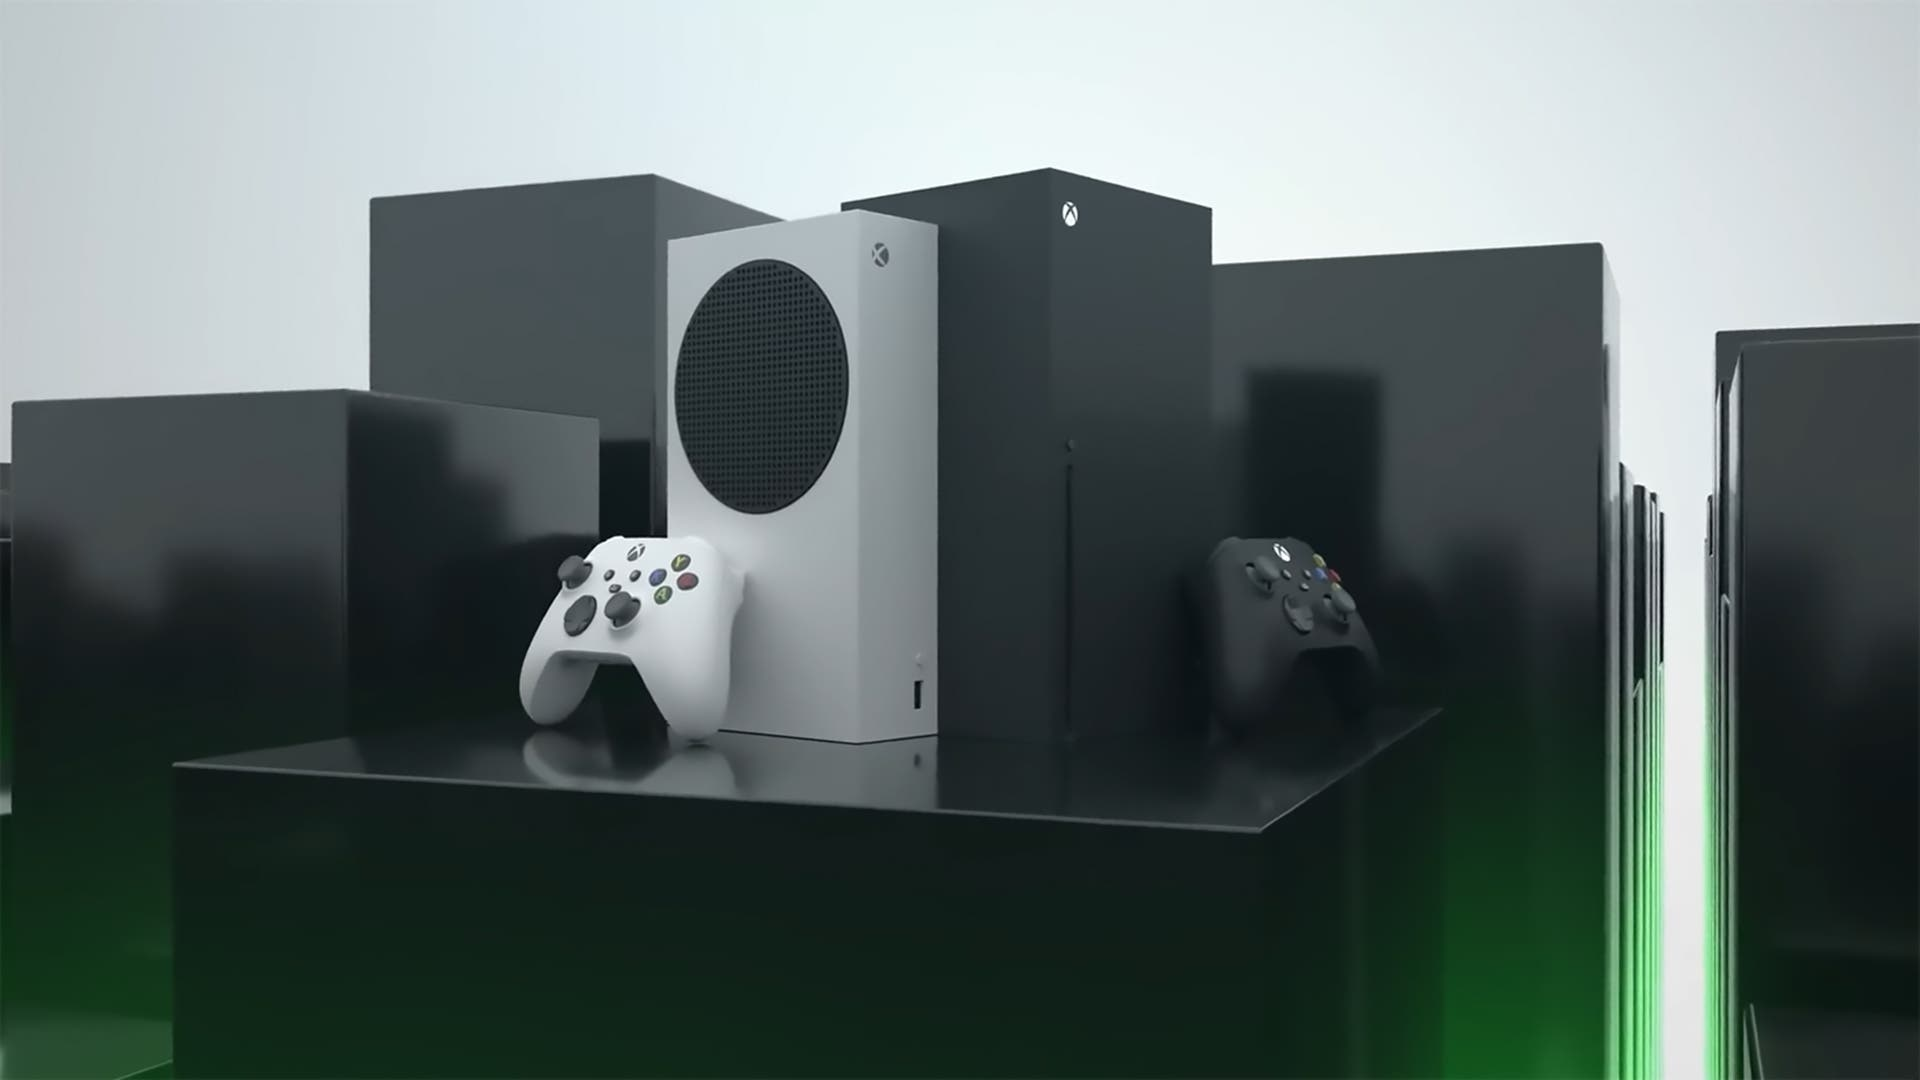 Guía de compra de Xbox Series S / X